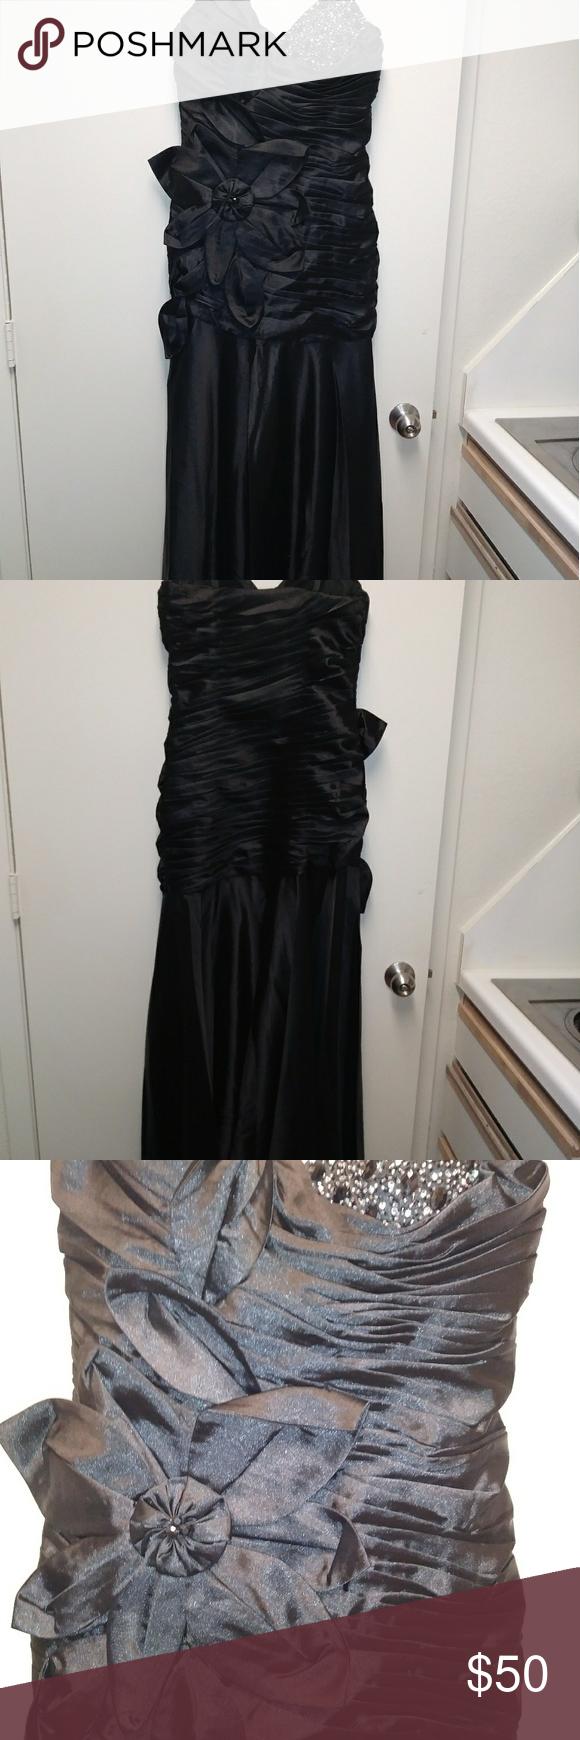 Nwot chicas long black formal dress medium long black formal